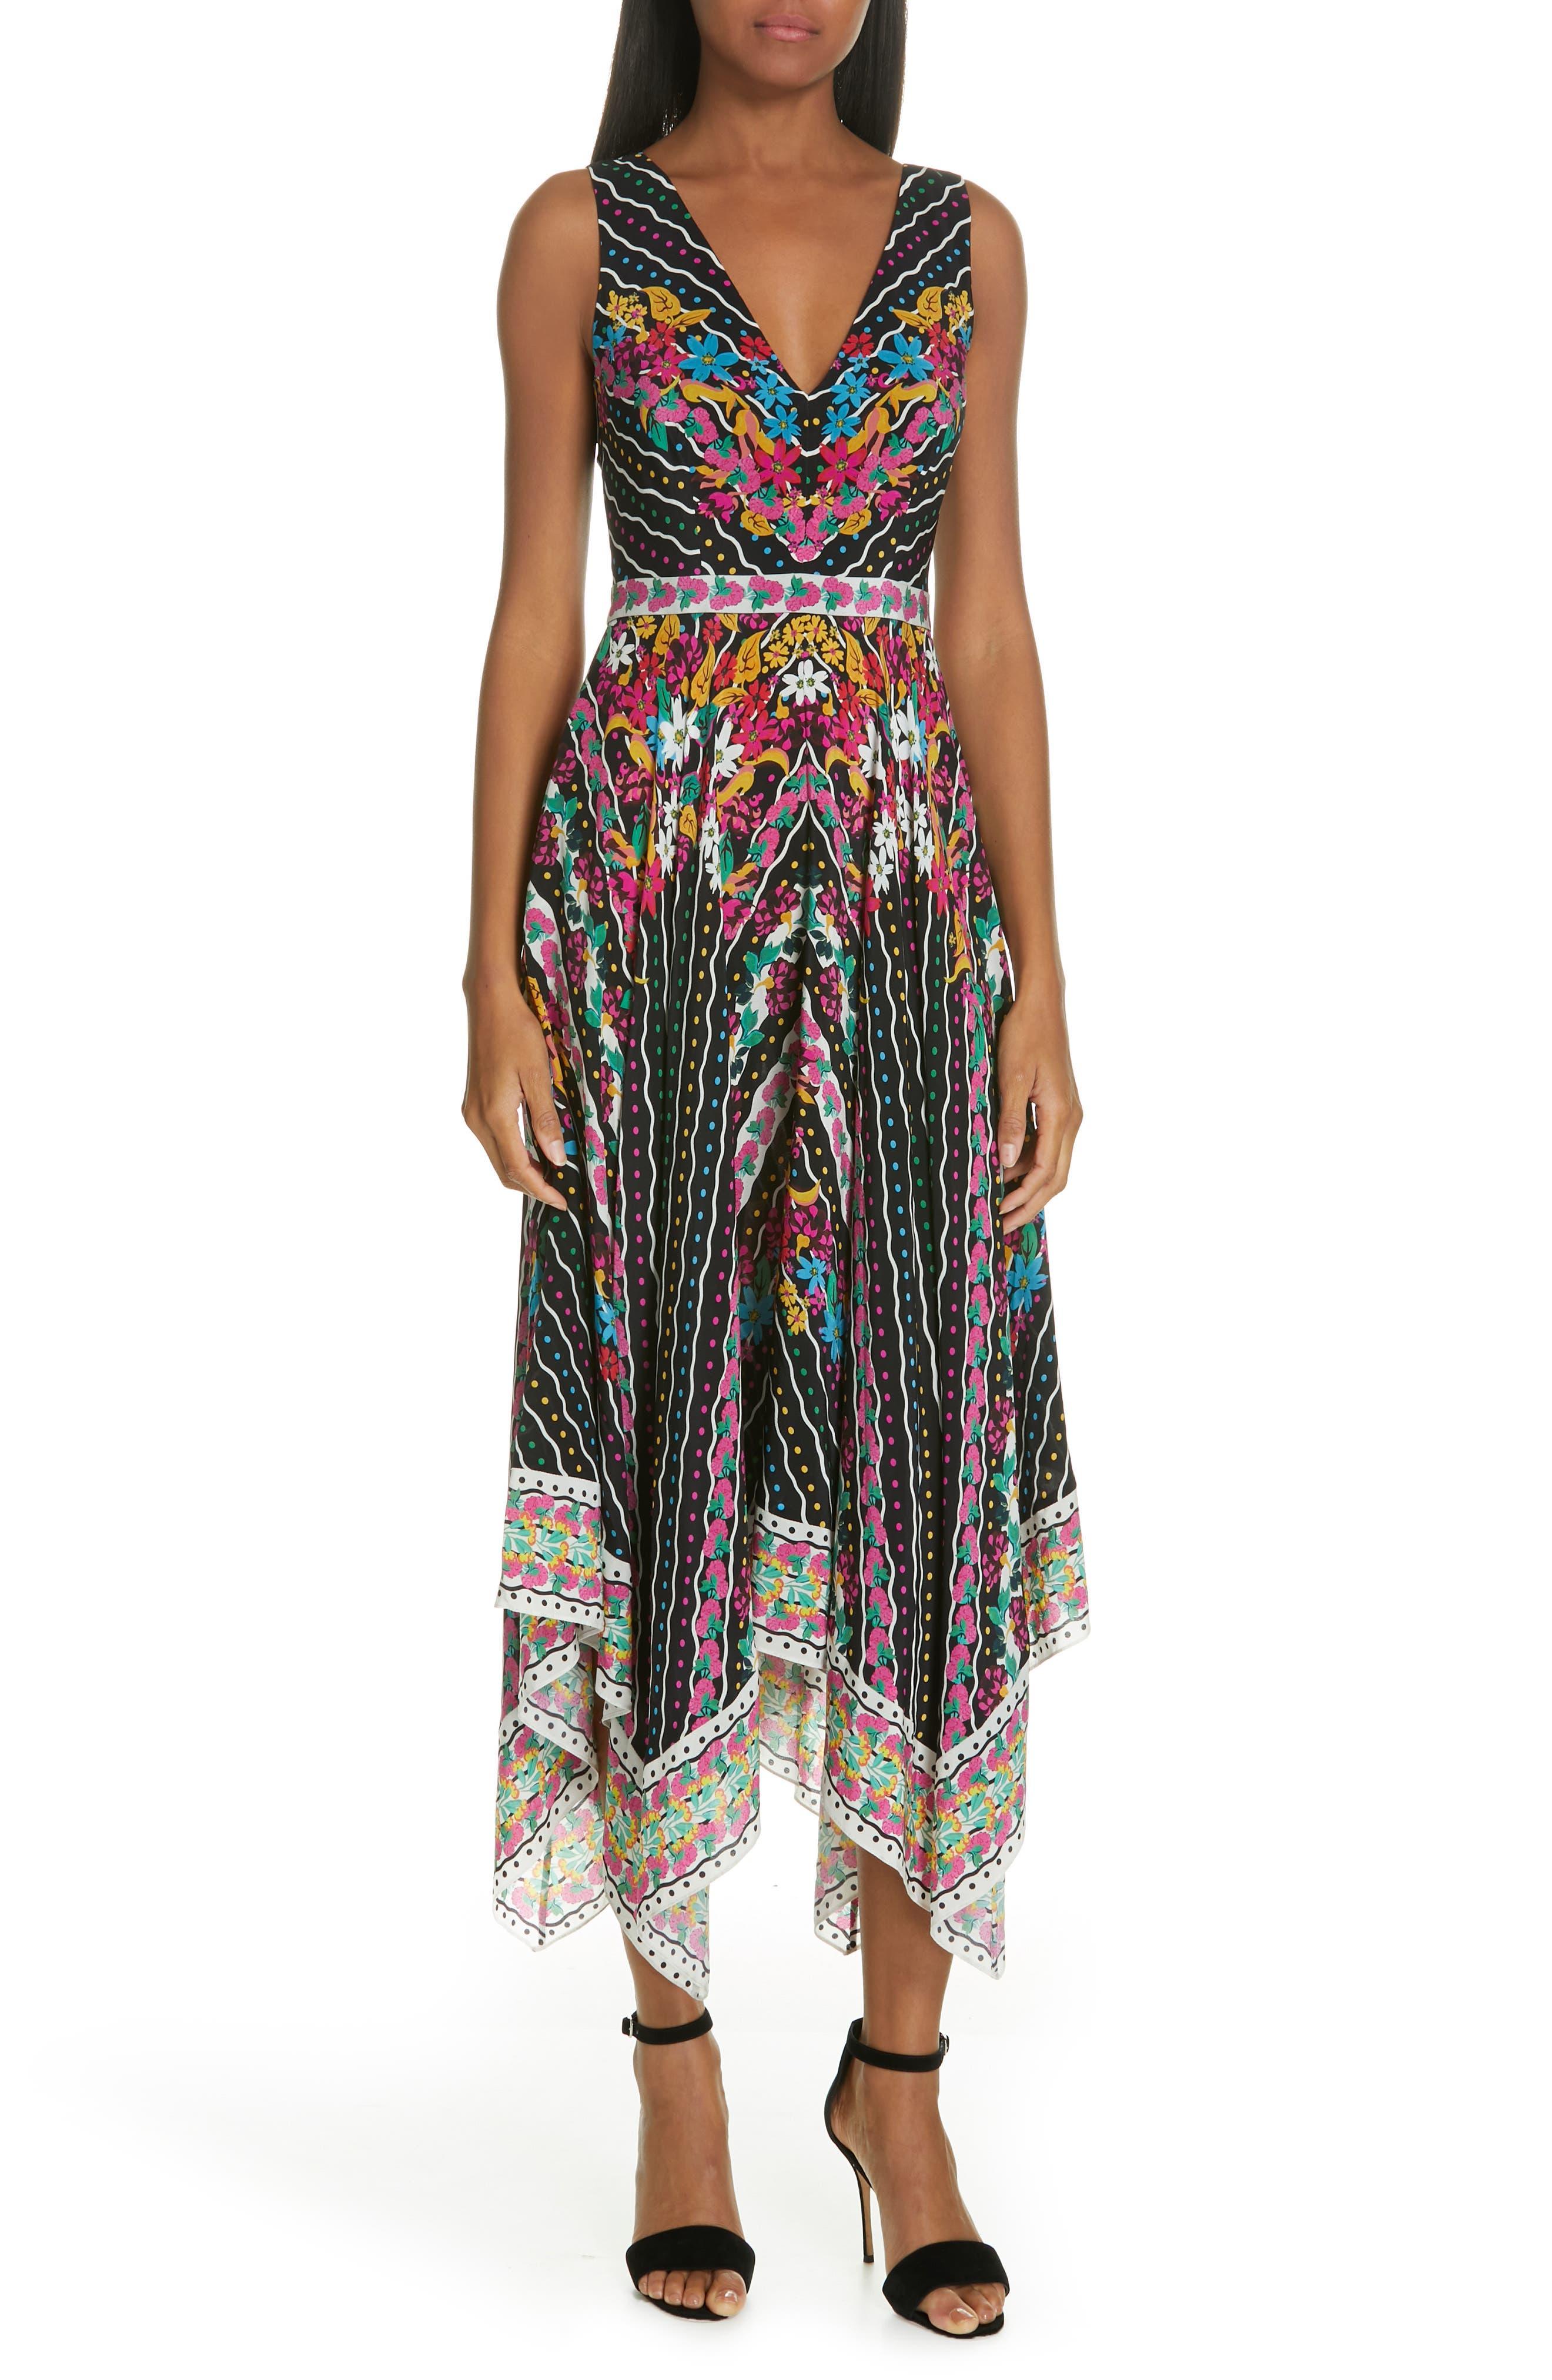 SALONI Zuri Printed Sleeveless V-Neck Dress in Japonica Garlands